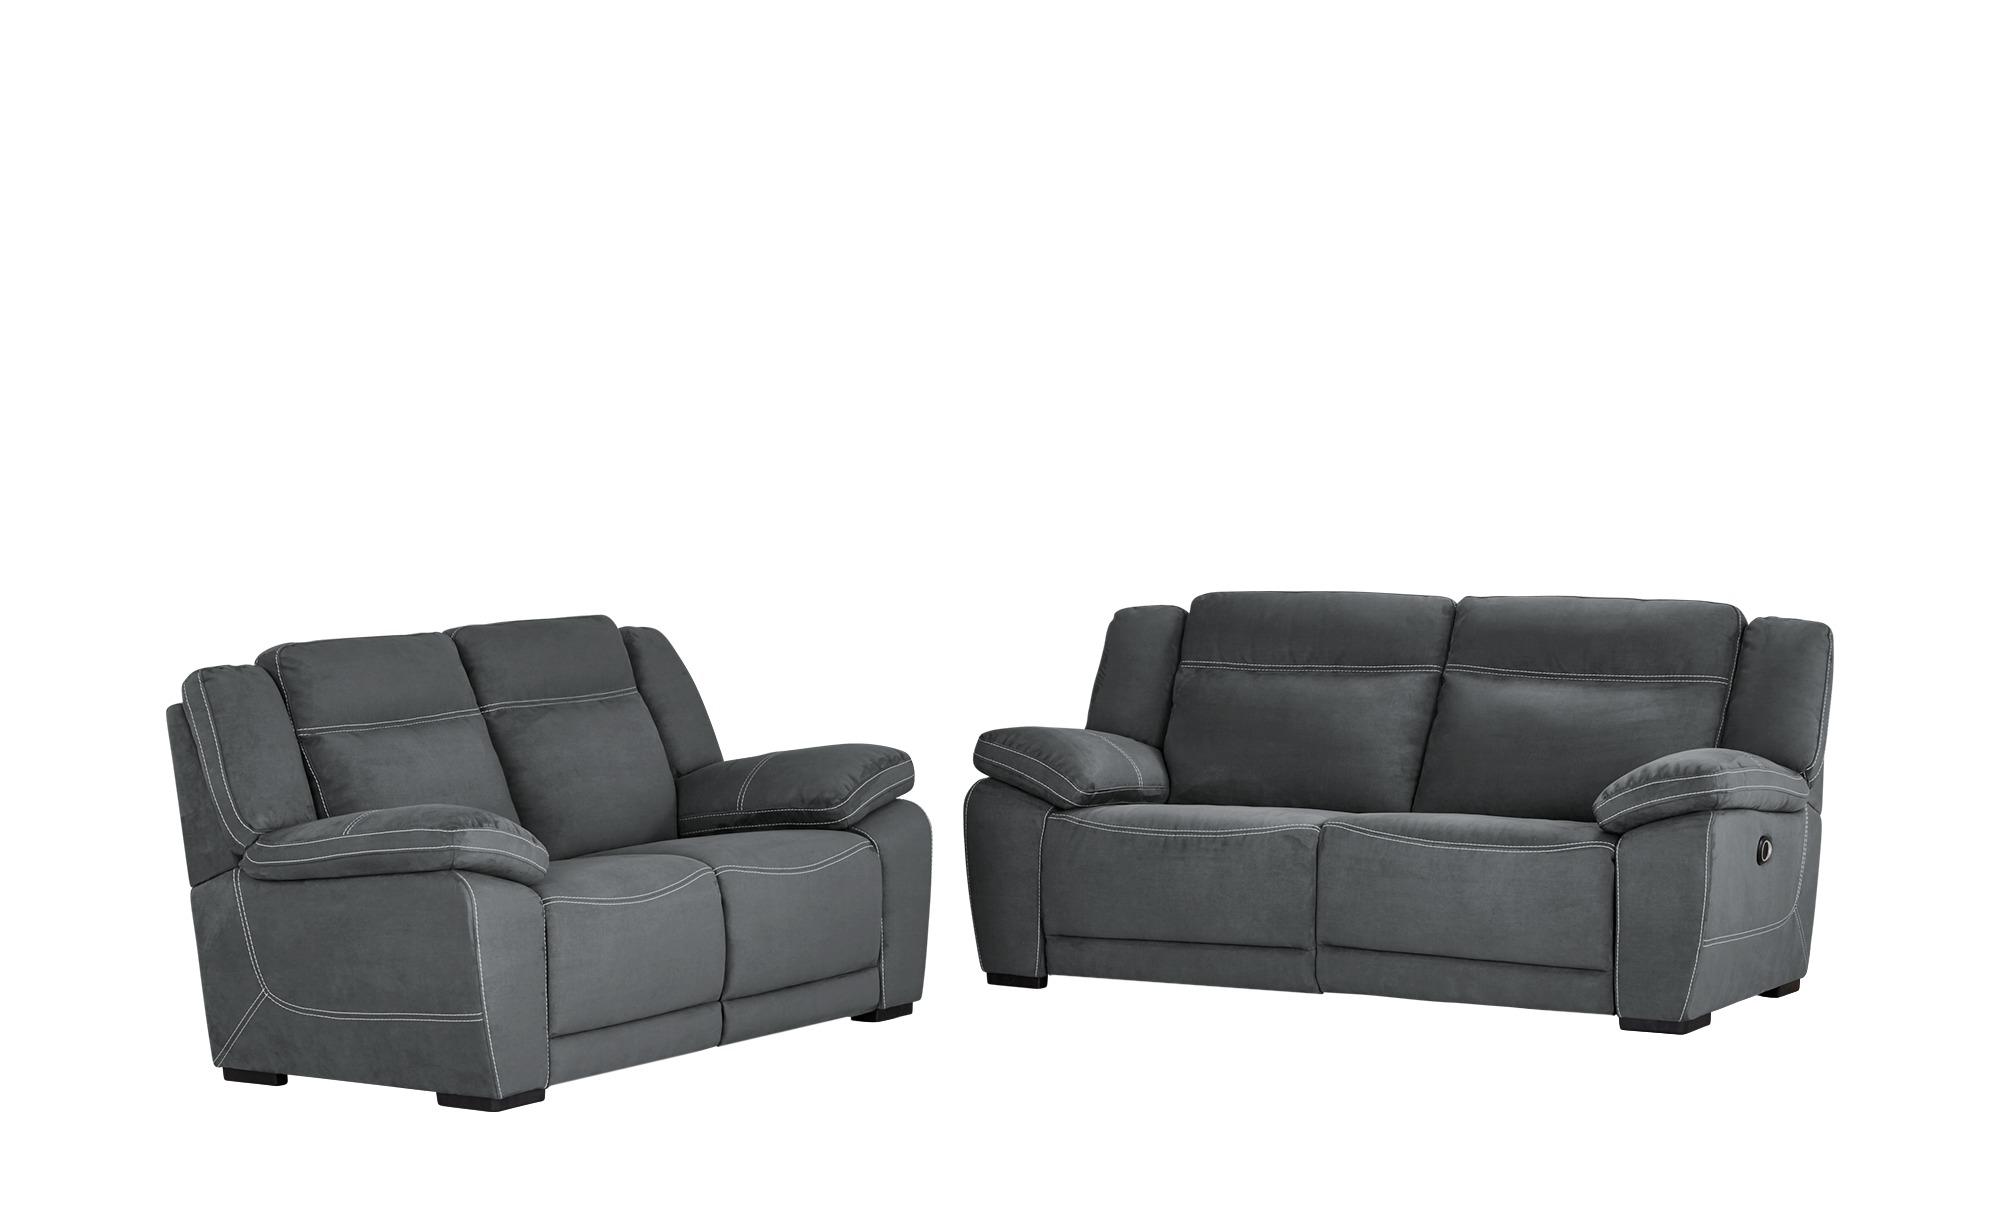 Full Size of Sofa Mit Relaxfunktion Elektrisch Couch Elektrische 2 5 Sitzer Elektrischer Zweisitzer Ecksofa Verstellbar 2er 3er 3 Leder Uno Sitzgruppe Binta Grau Sofa Sofa Mit Relaxfunktion Elektrisch